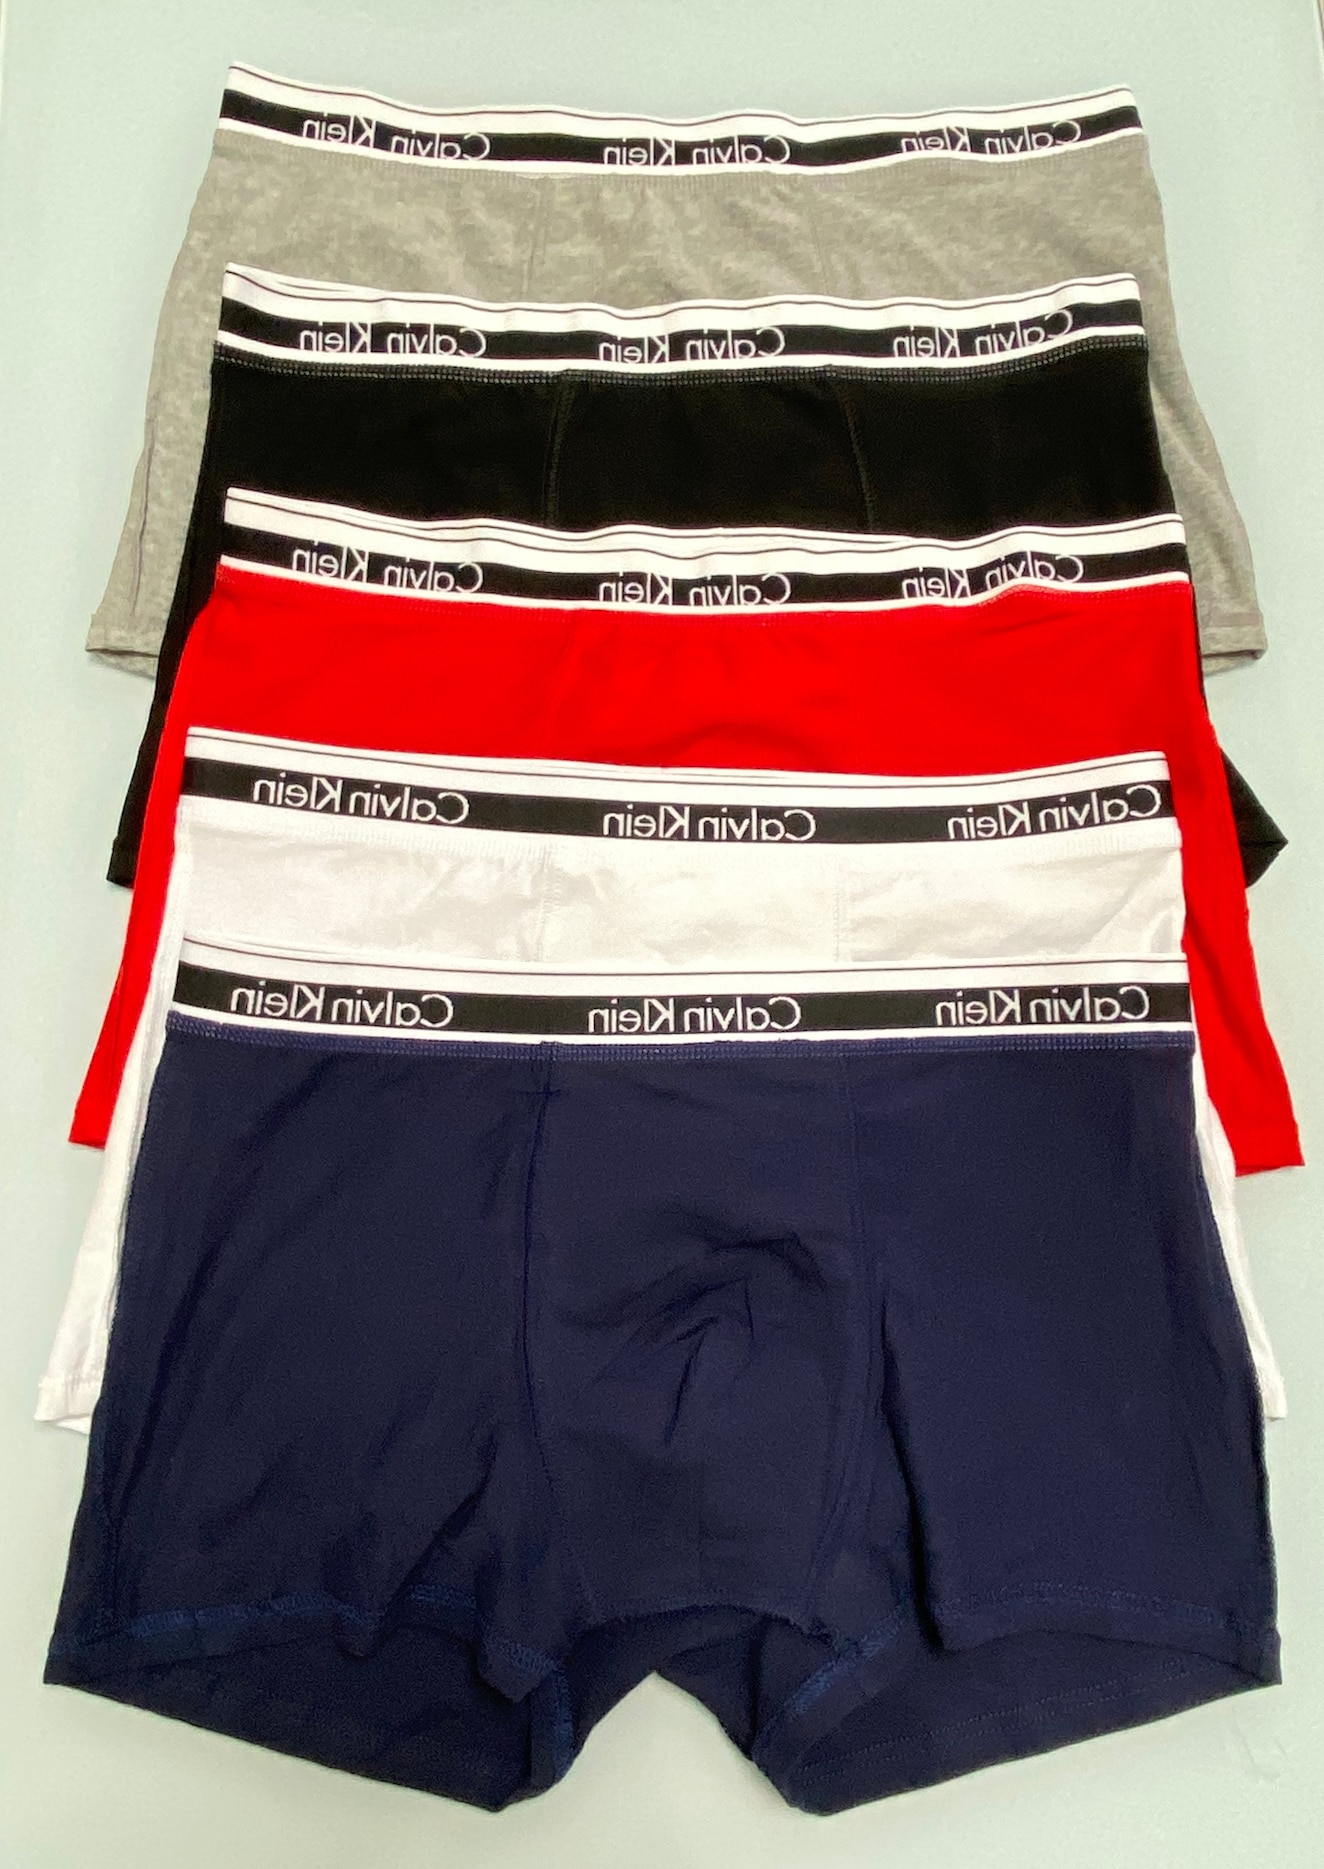 Trendy Brand Men's Underwear Men's Pure Cotton Breathable Boxer Shorts Pure Cotton Boxer Shorts 2021